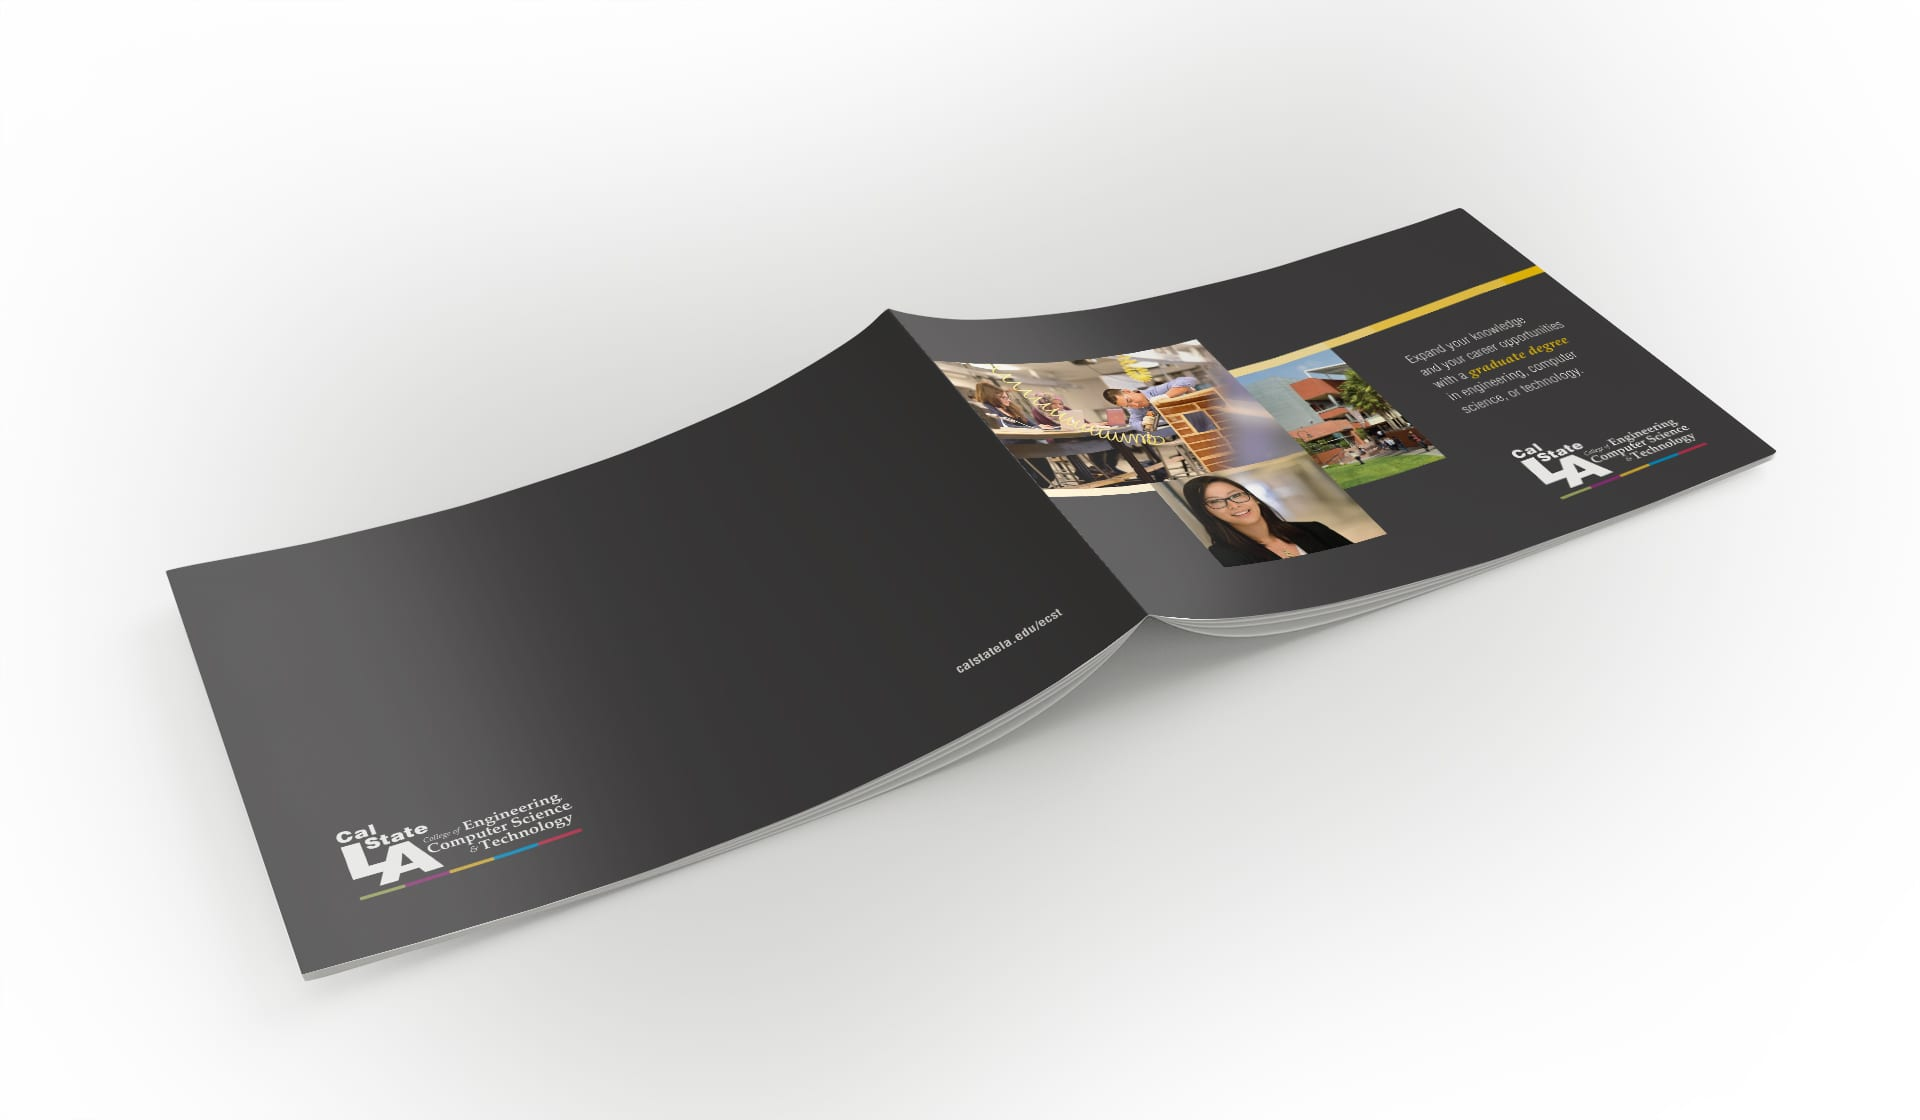 Graduate brochure cover